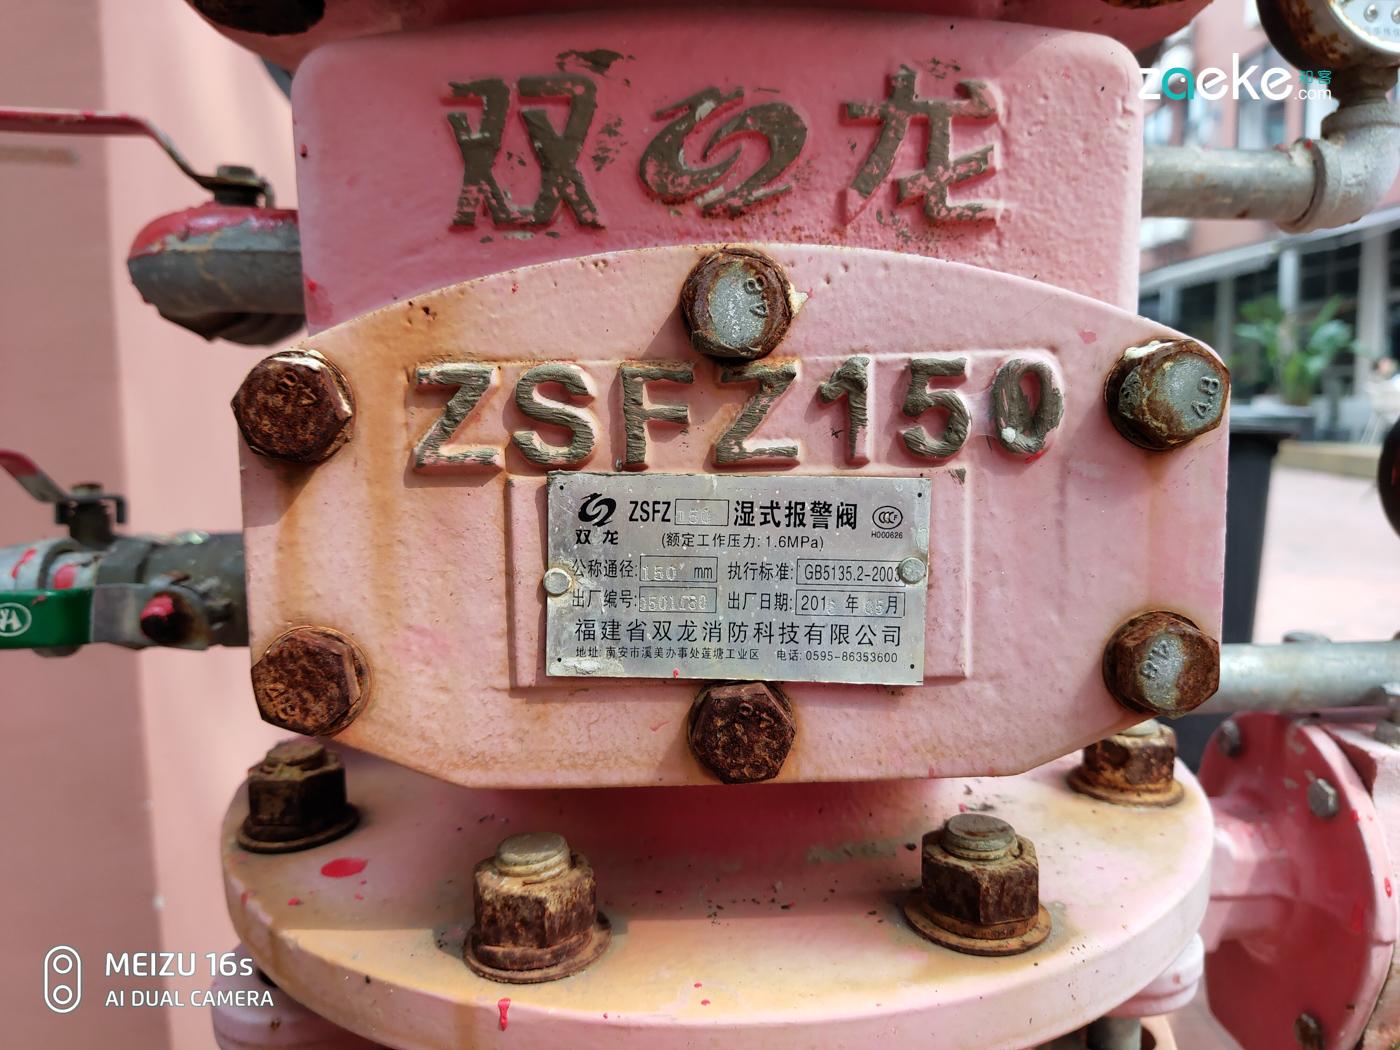 P90510-151714.jpg